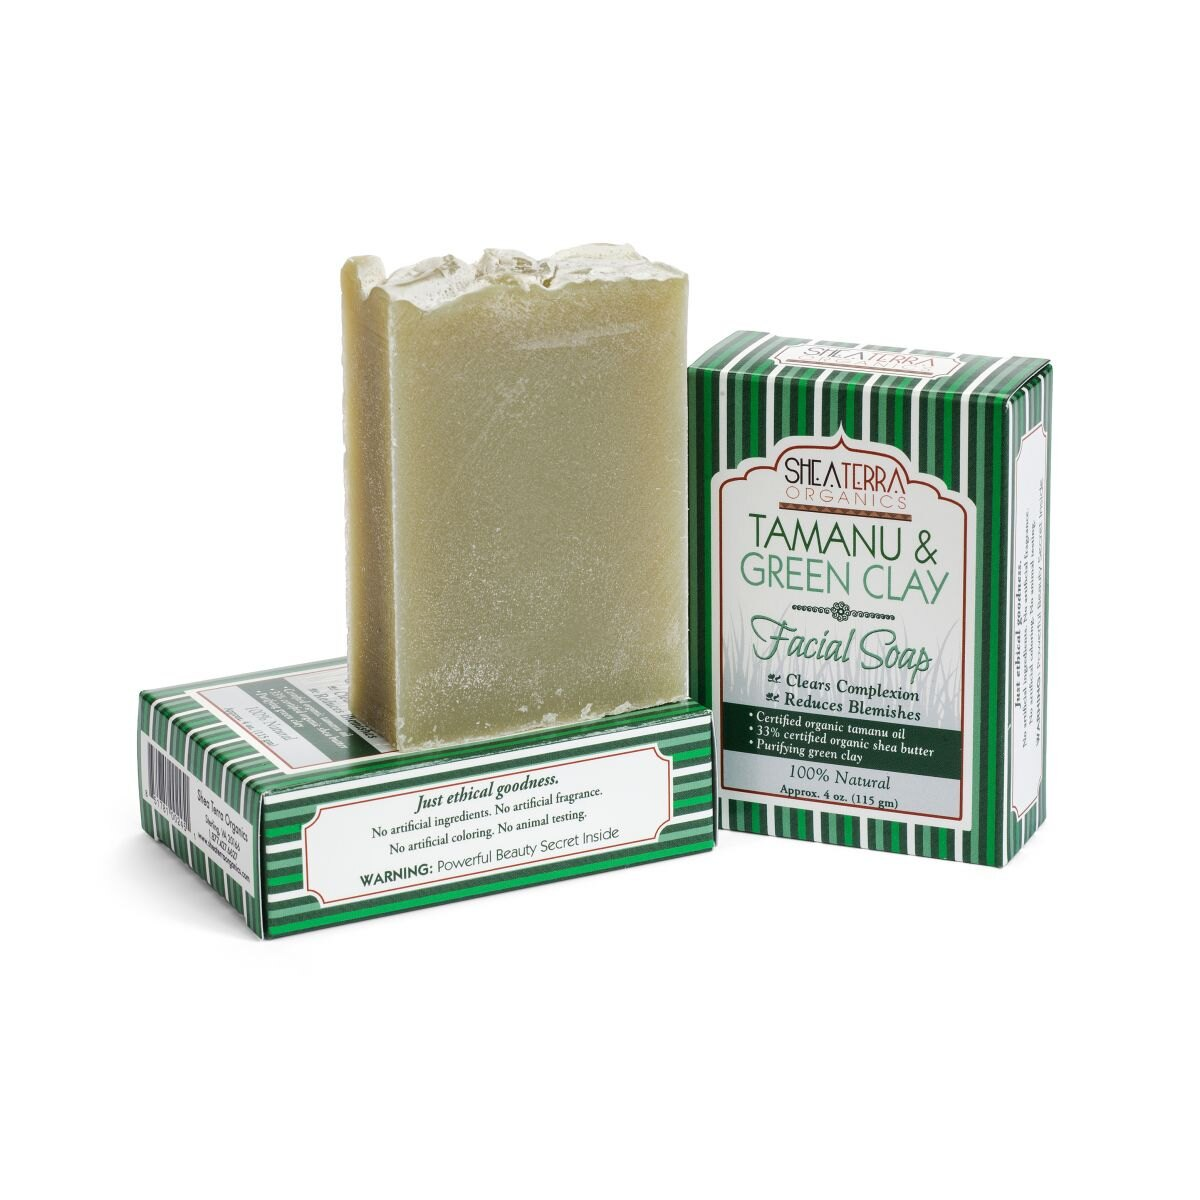 【SHEA TERRA】 瓊崖海棠&綠礦物泥淨化臉部/身體清潔皂